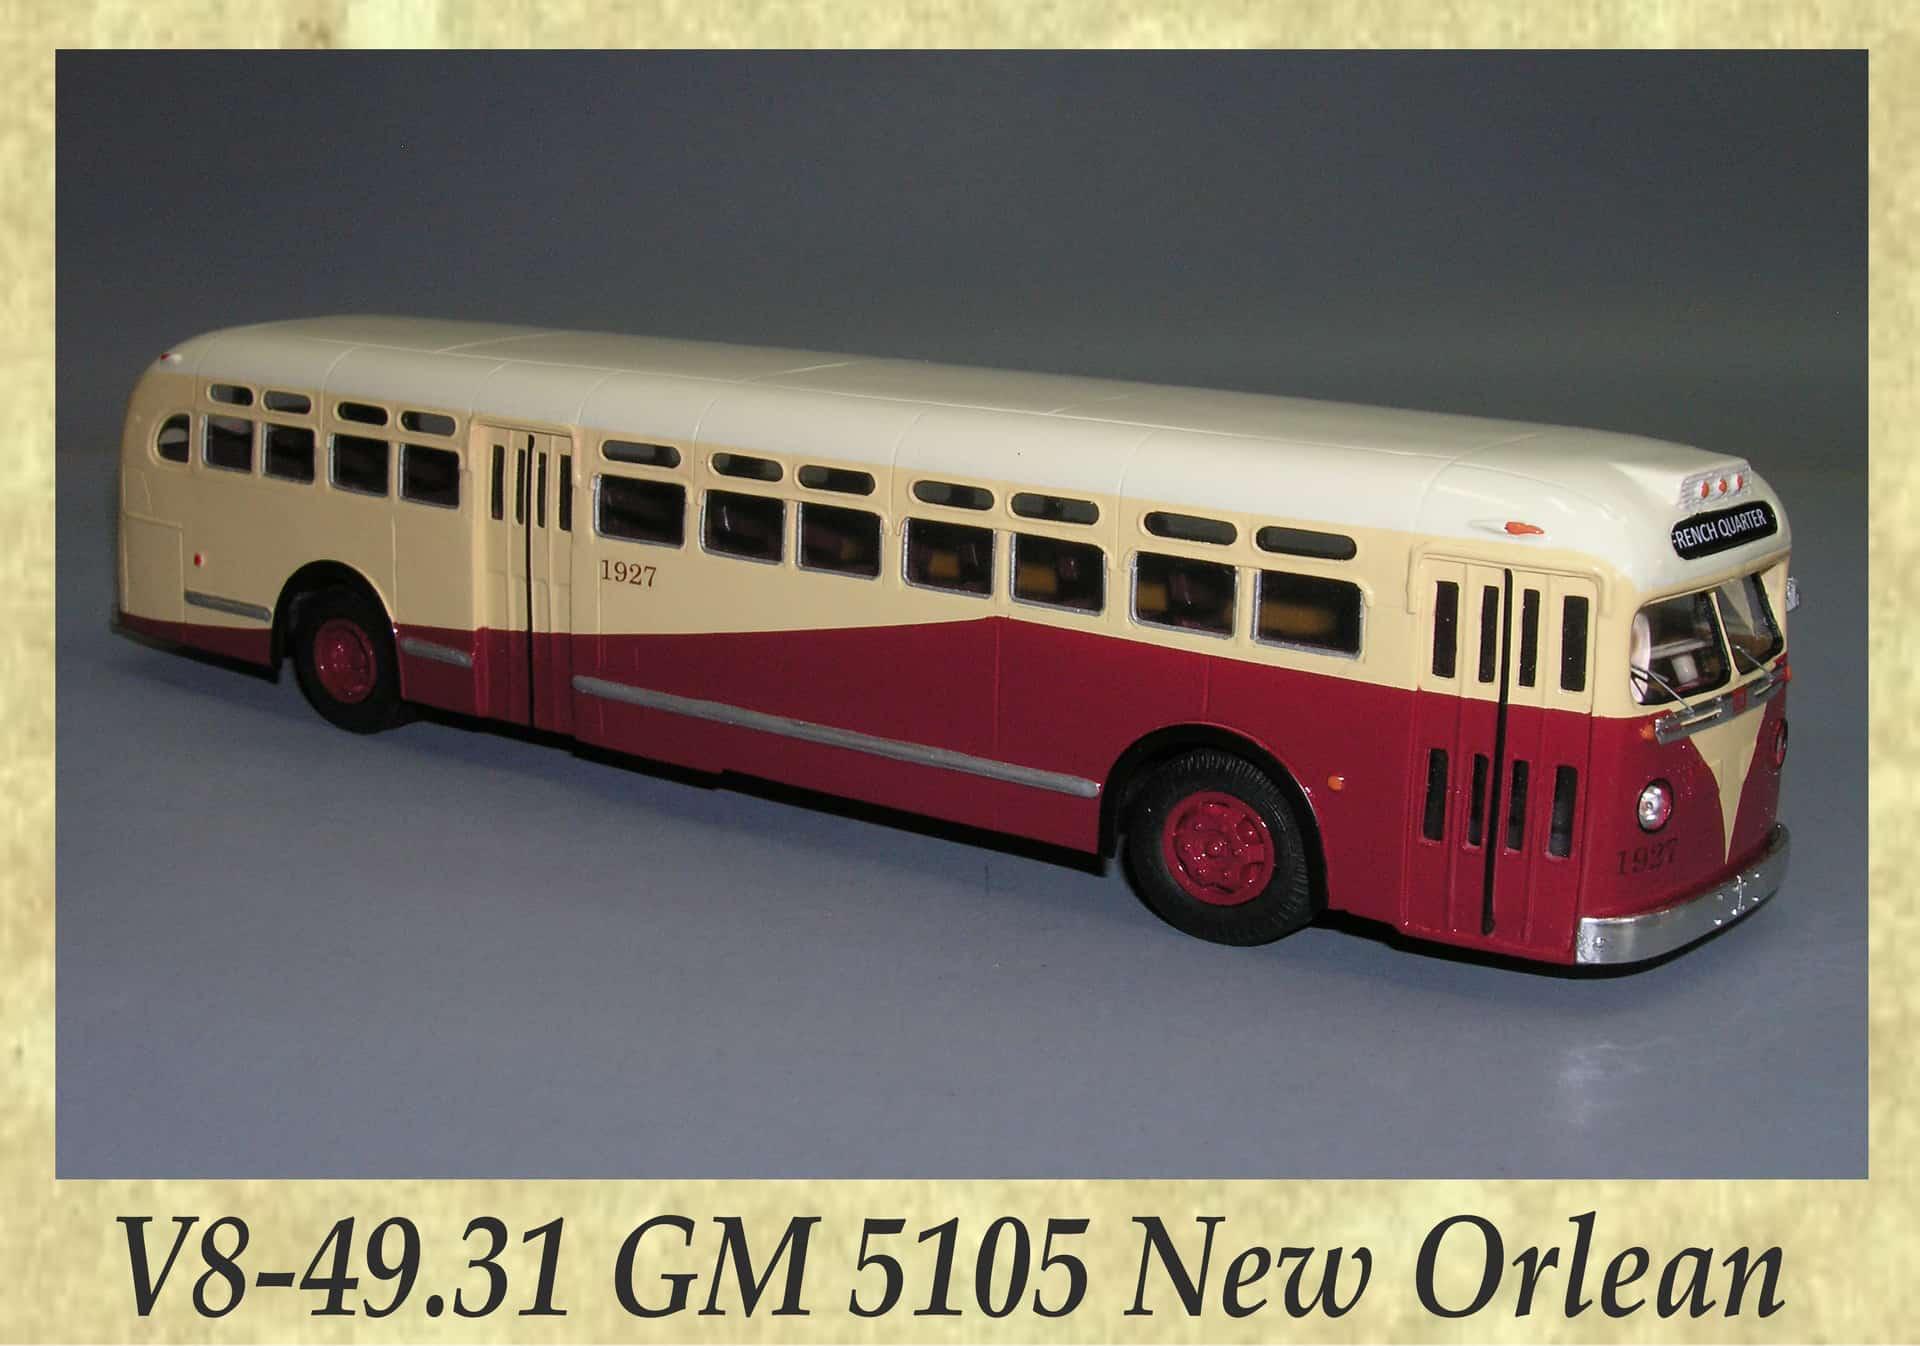 V8-49.31 GM 5105 New Orlean